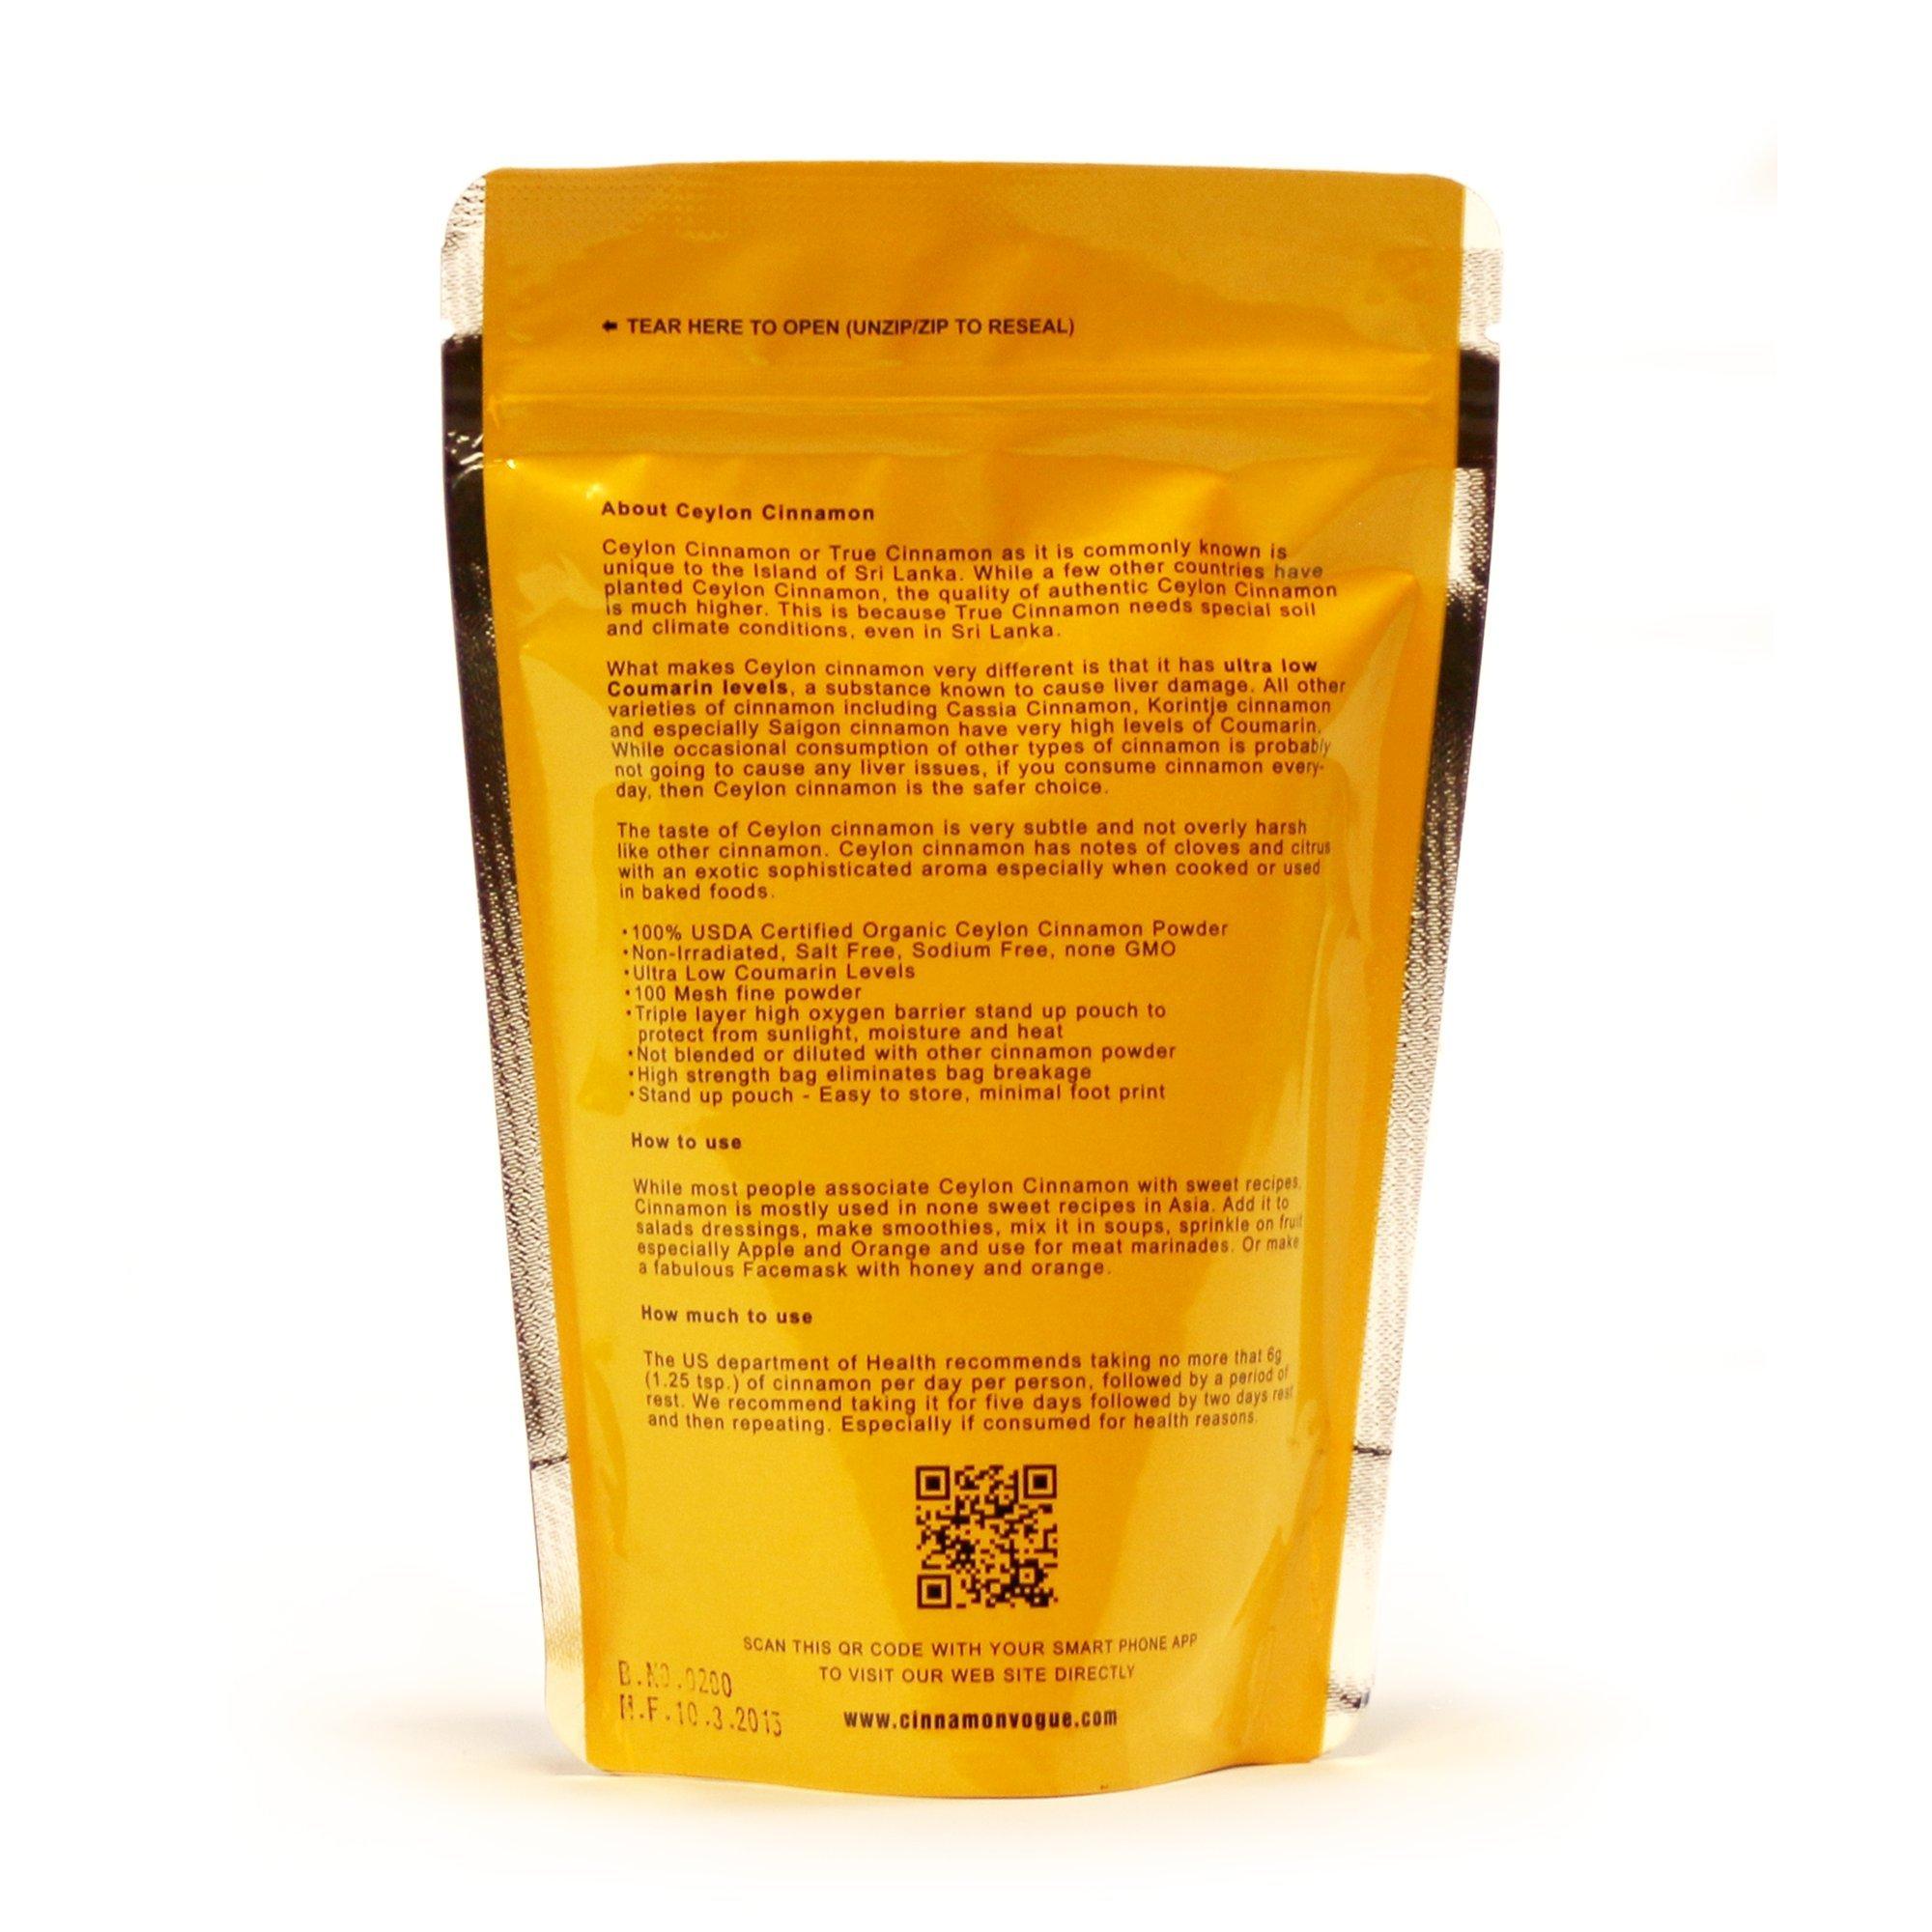 Ceylon Cinnamon Powder – 6 oz. (100% USDA Organic) - Ultra Premium Fine 100 Mesh Powder, Salt Free, Non irradiated, Low Coumarin by Cinnamon Vogue (Image #3)